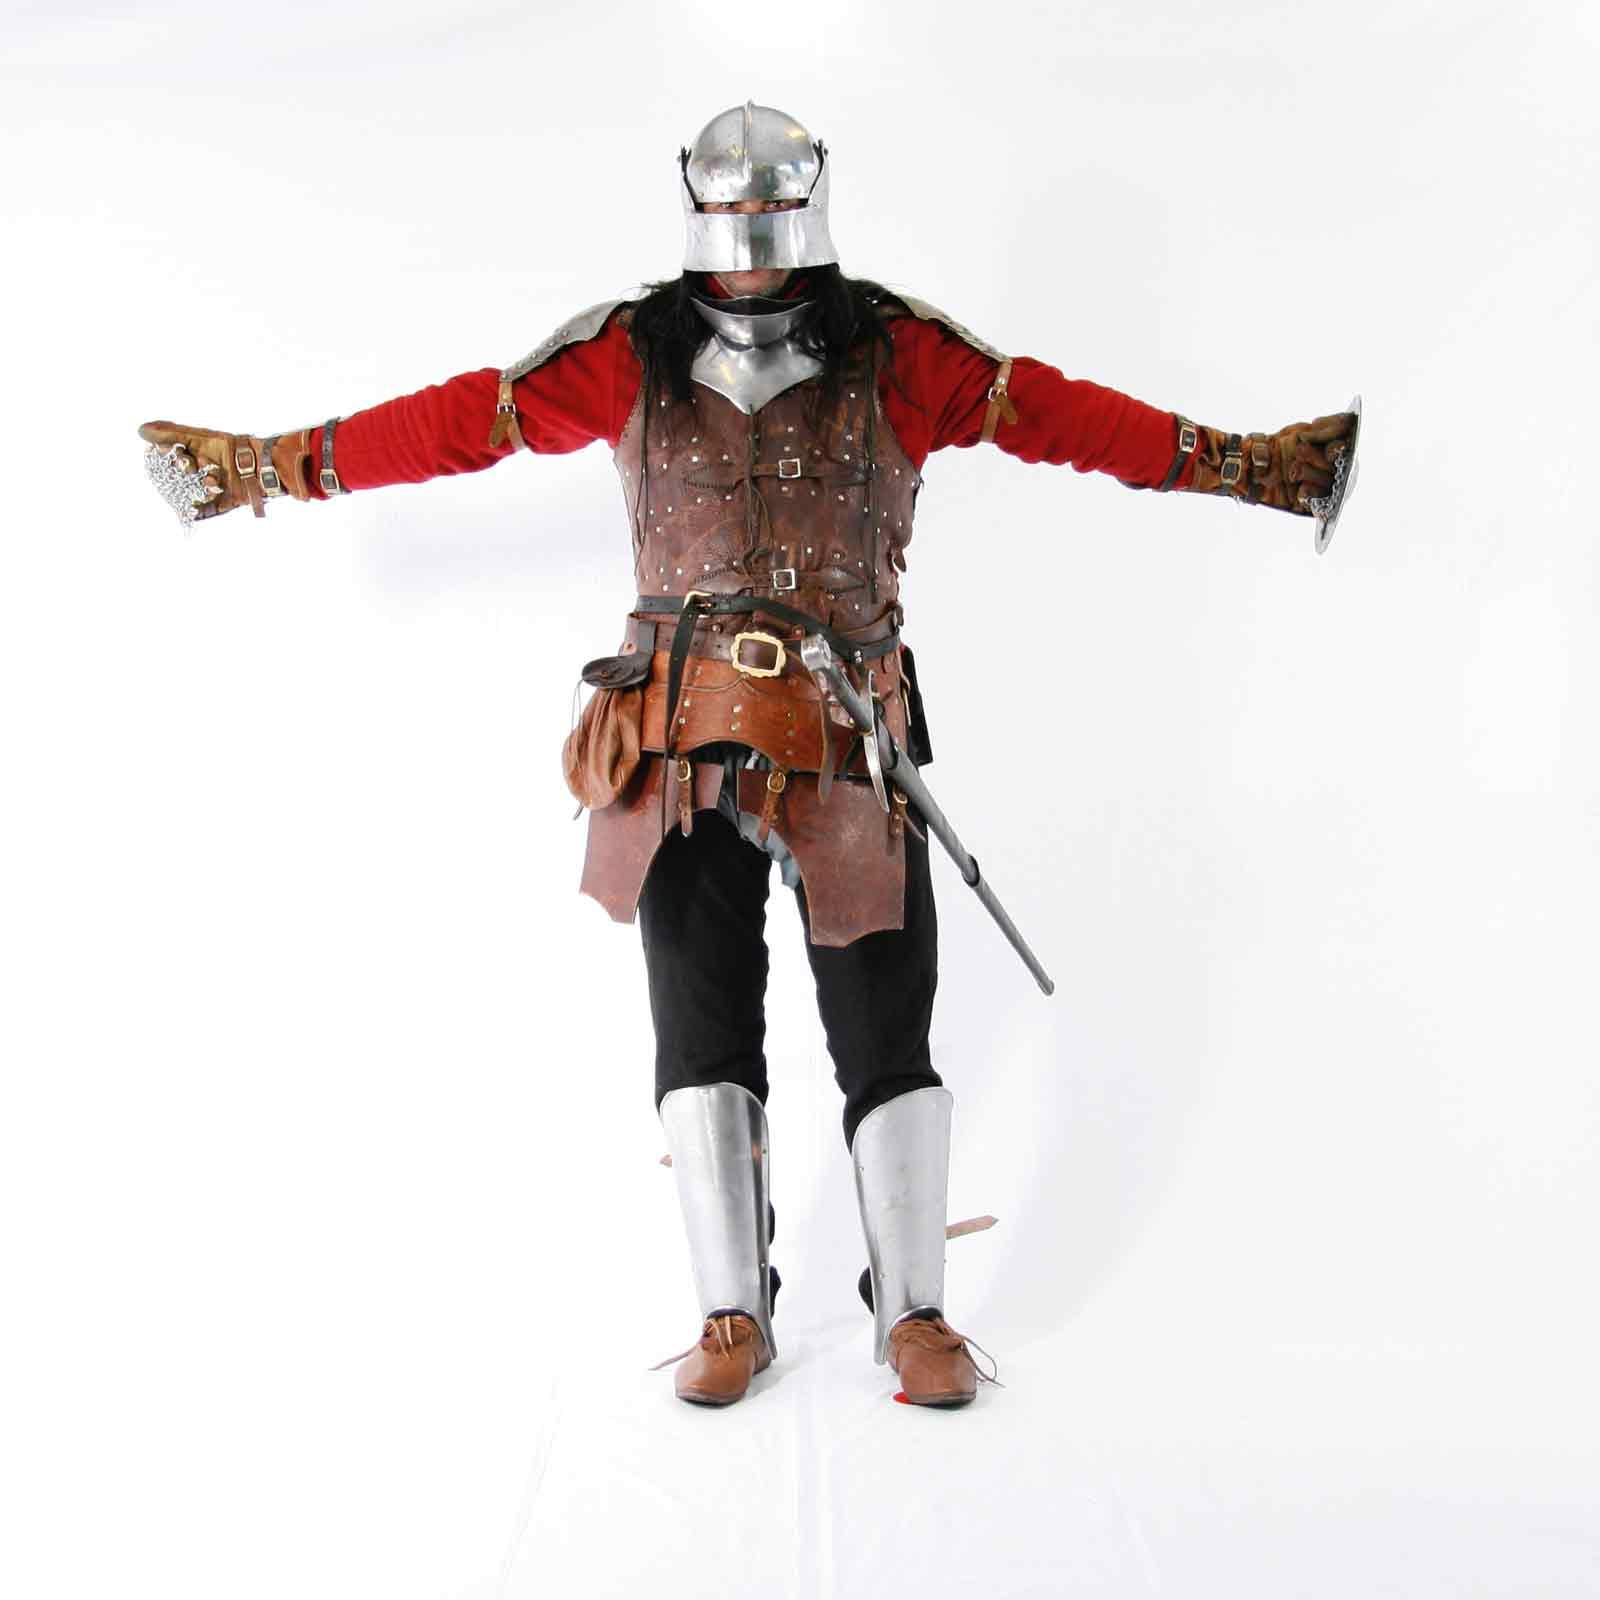 Ivan-Baxter-Smith-armour-copy.jpg